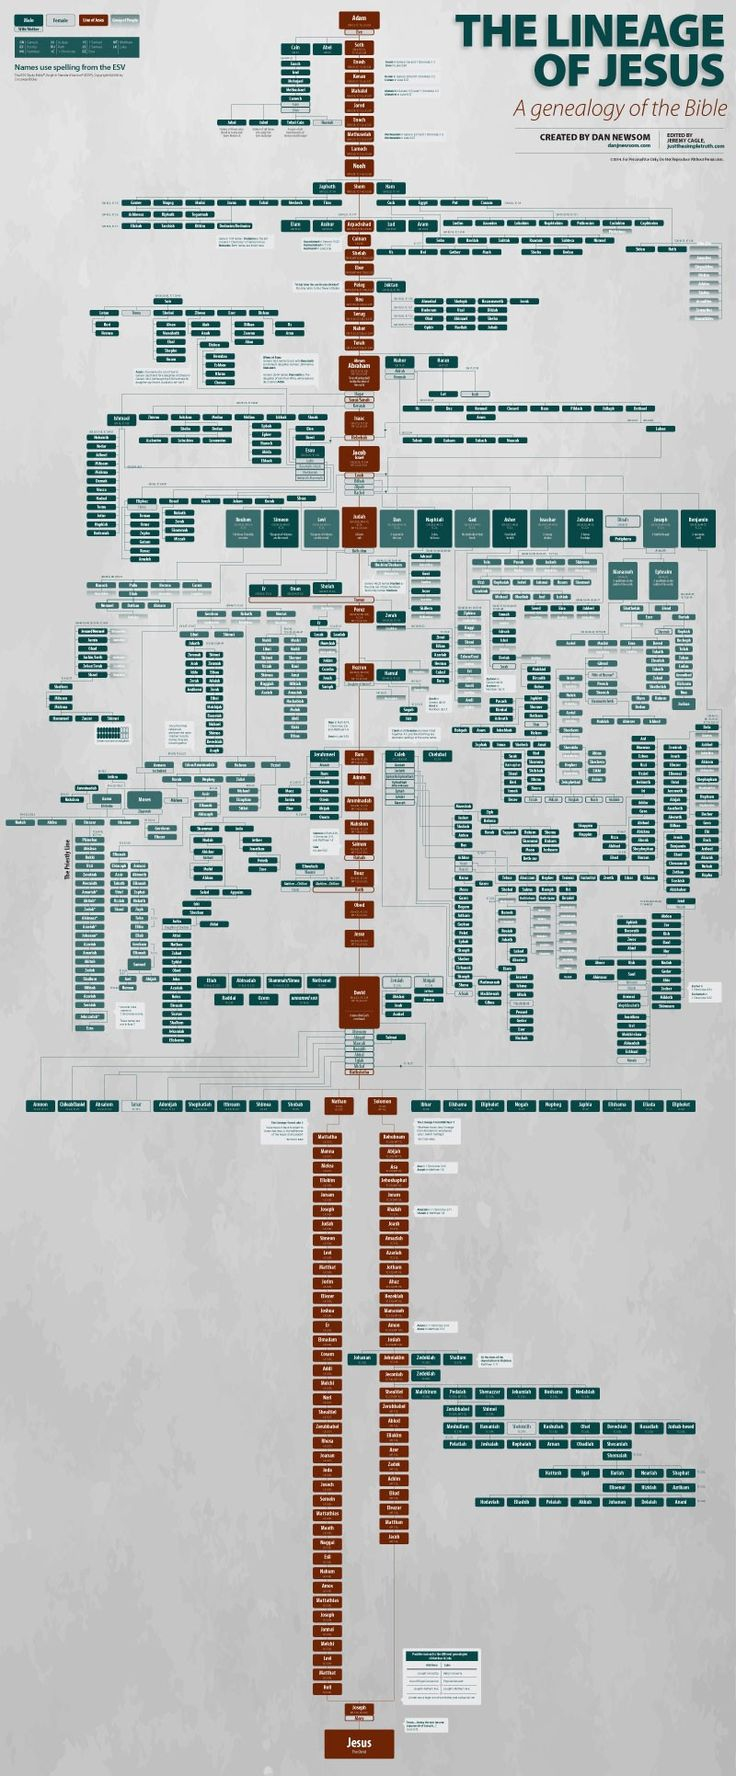 GENEALOGY IN THE BIBLE - King James Version